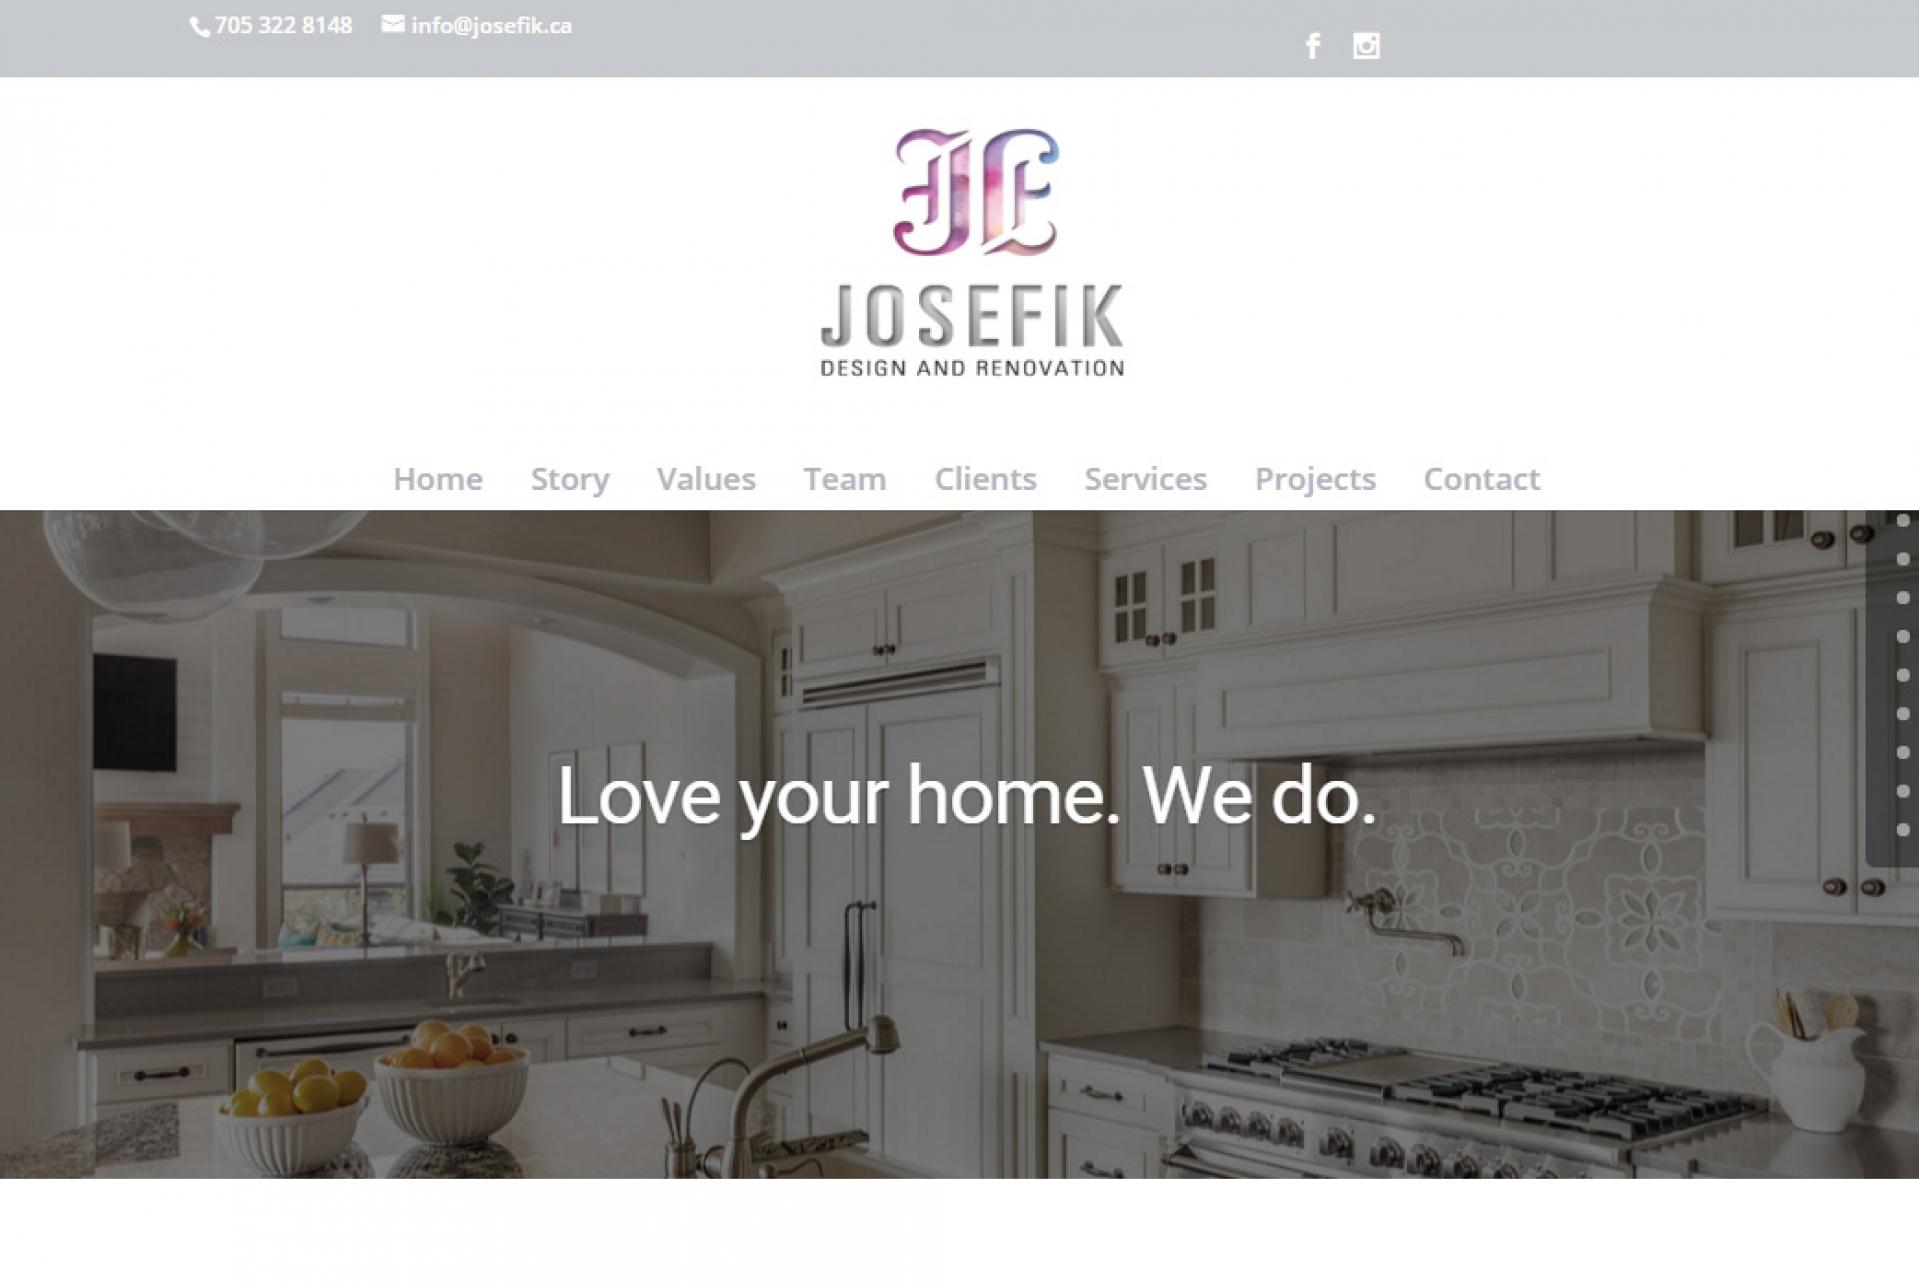 Josefik Website